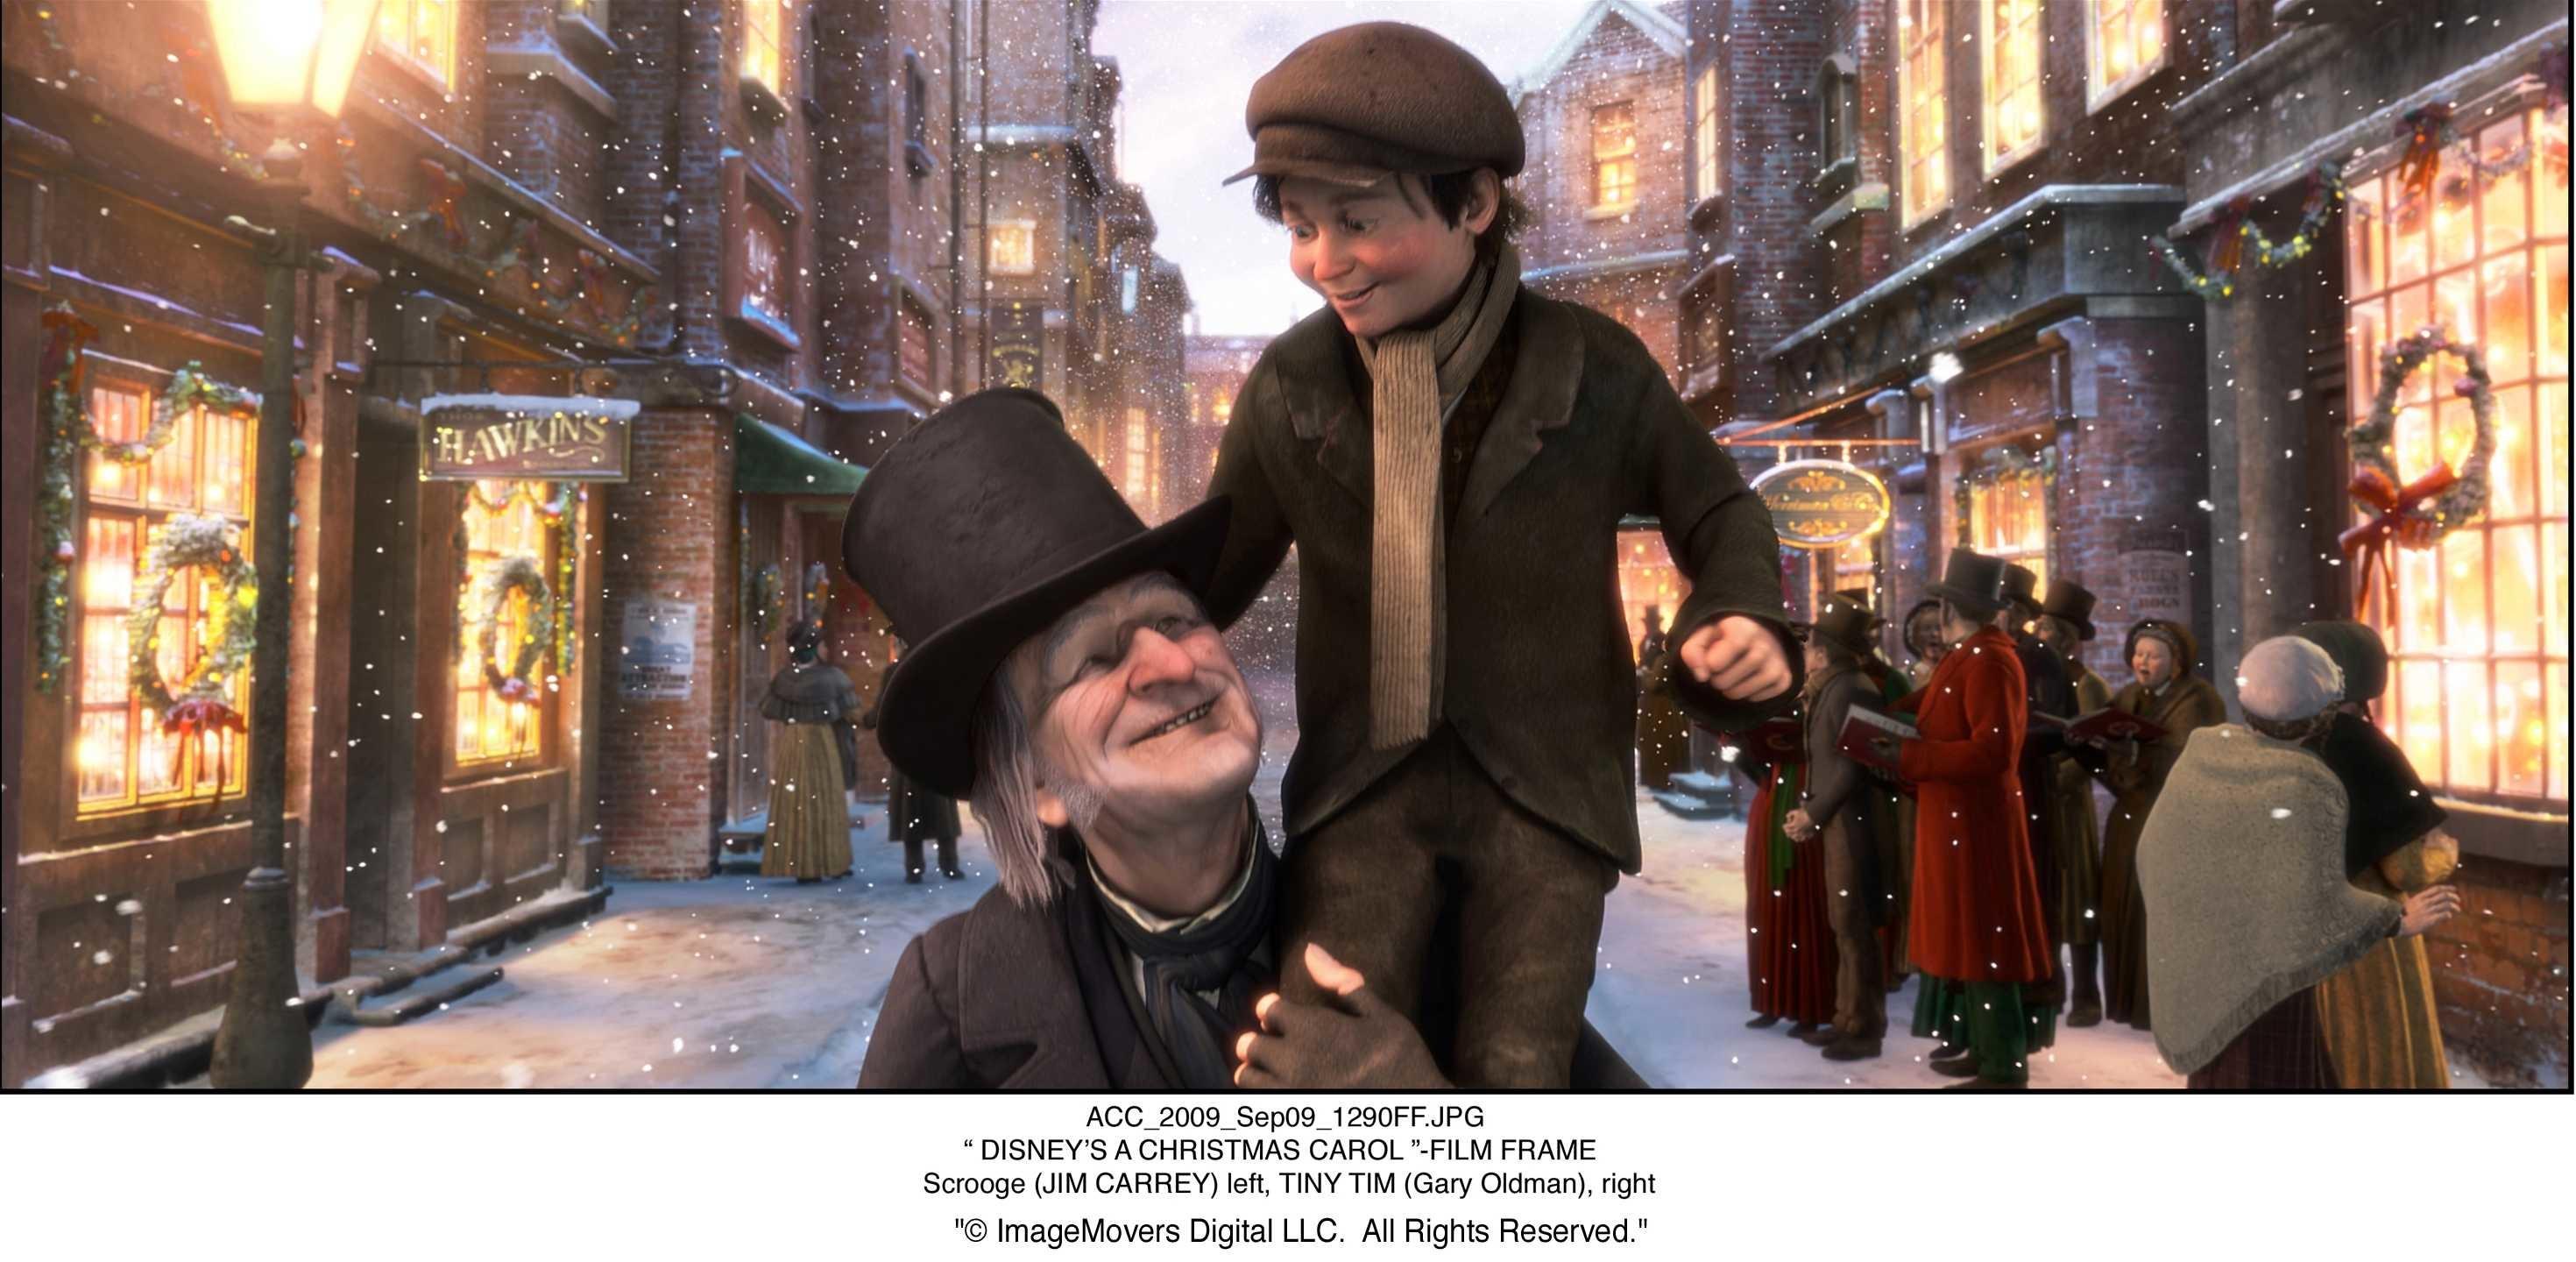 Res: 2940x1440, Ebenezer Scrooge (Jim Carrey) and Tiny Tim (Gary Oldman) stars in DISNEY'S